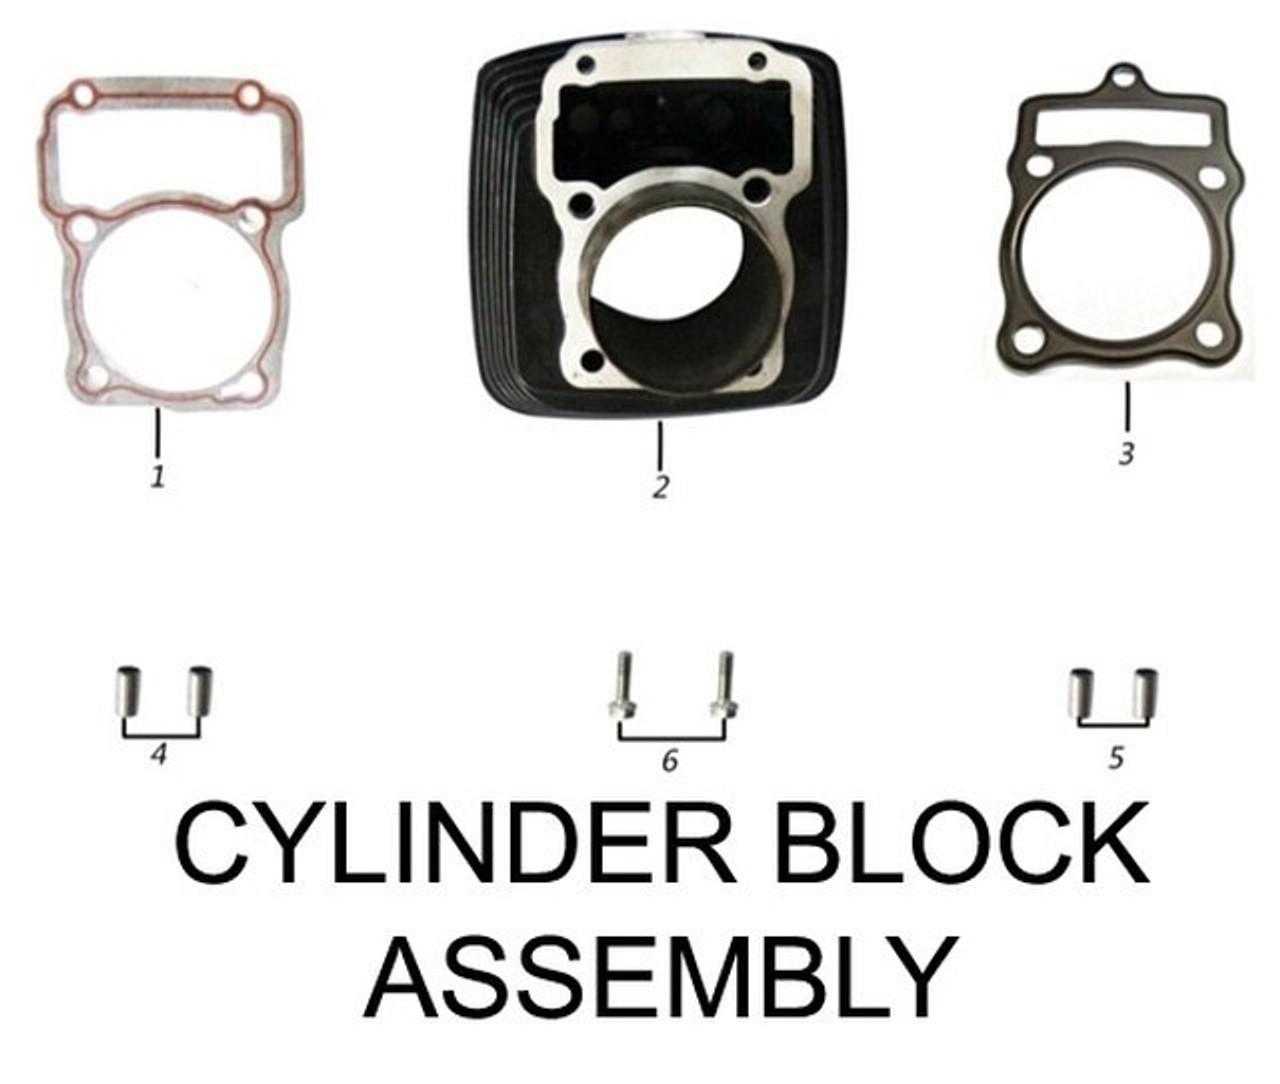 ENGINE CYLINDER BLOCK ASSEMBLY